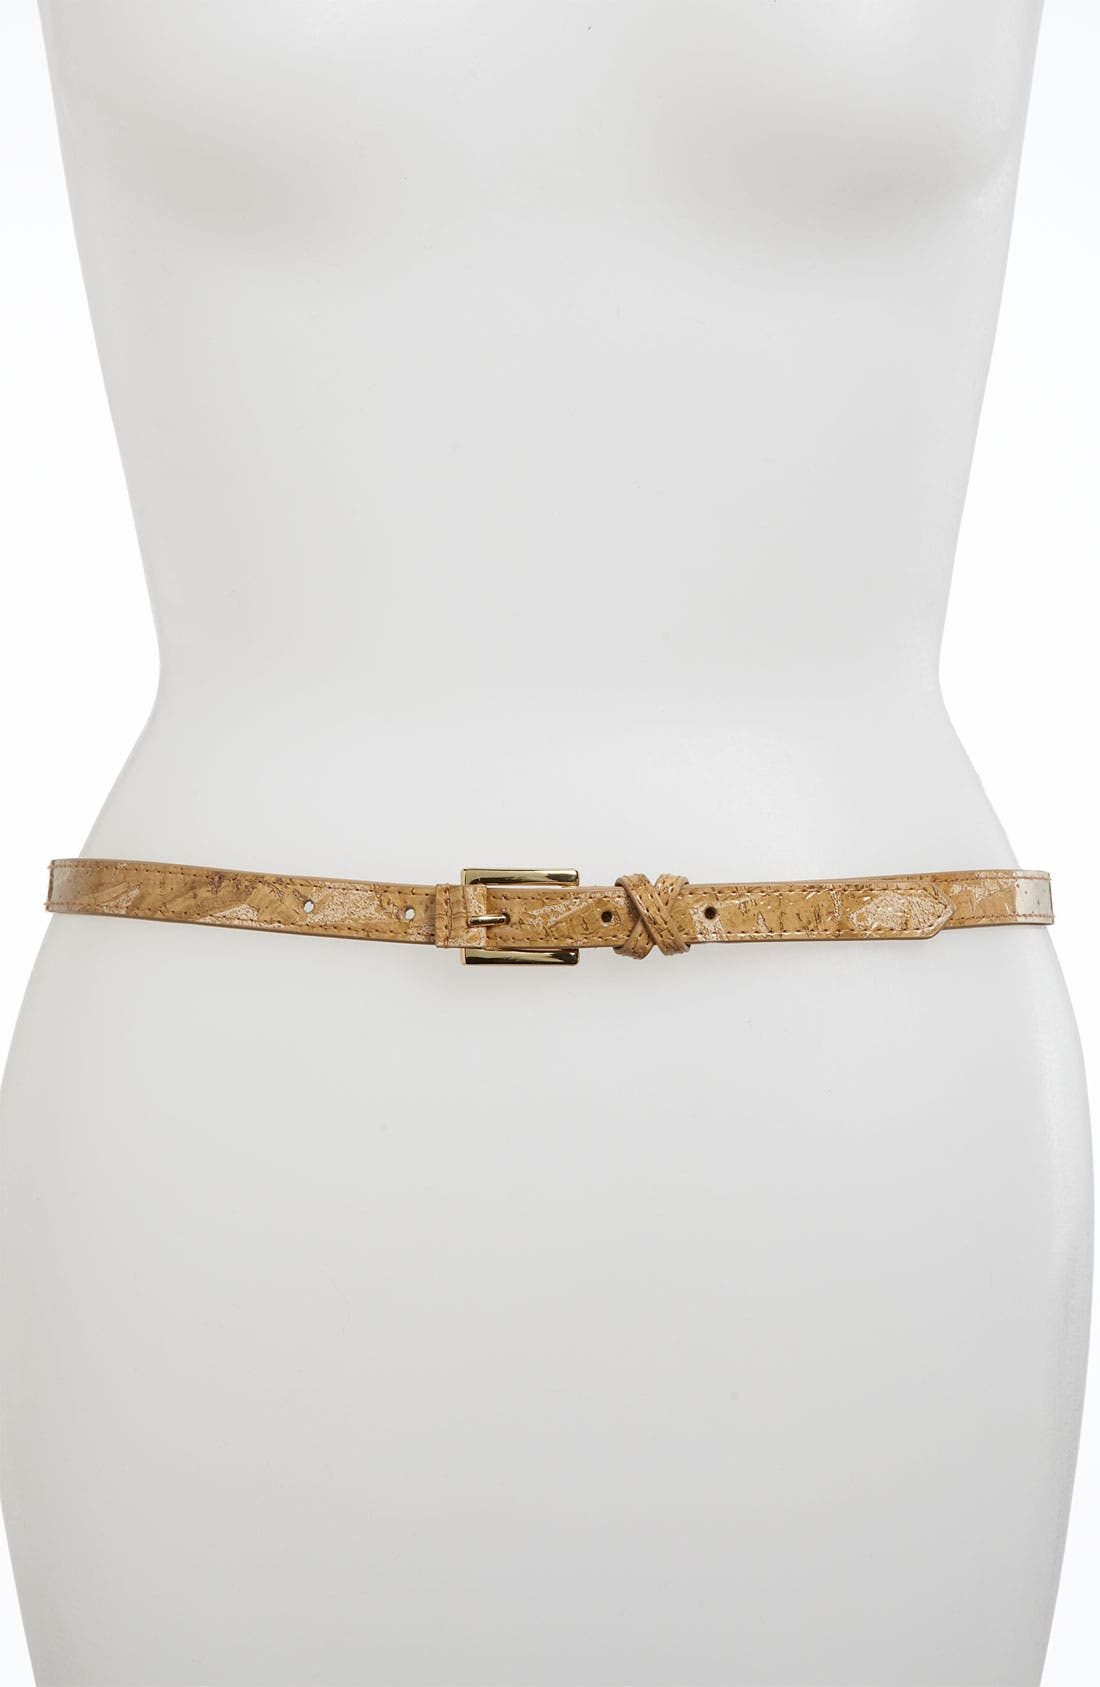 Alternate Image 1 Selected - Via Spiga 'Cork' Skinny Belt